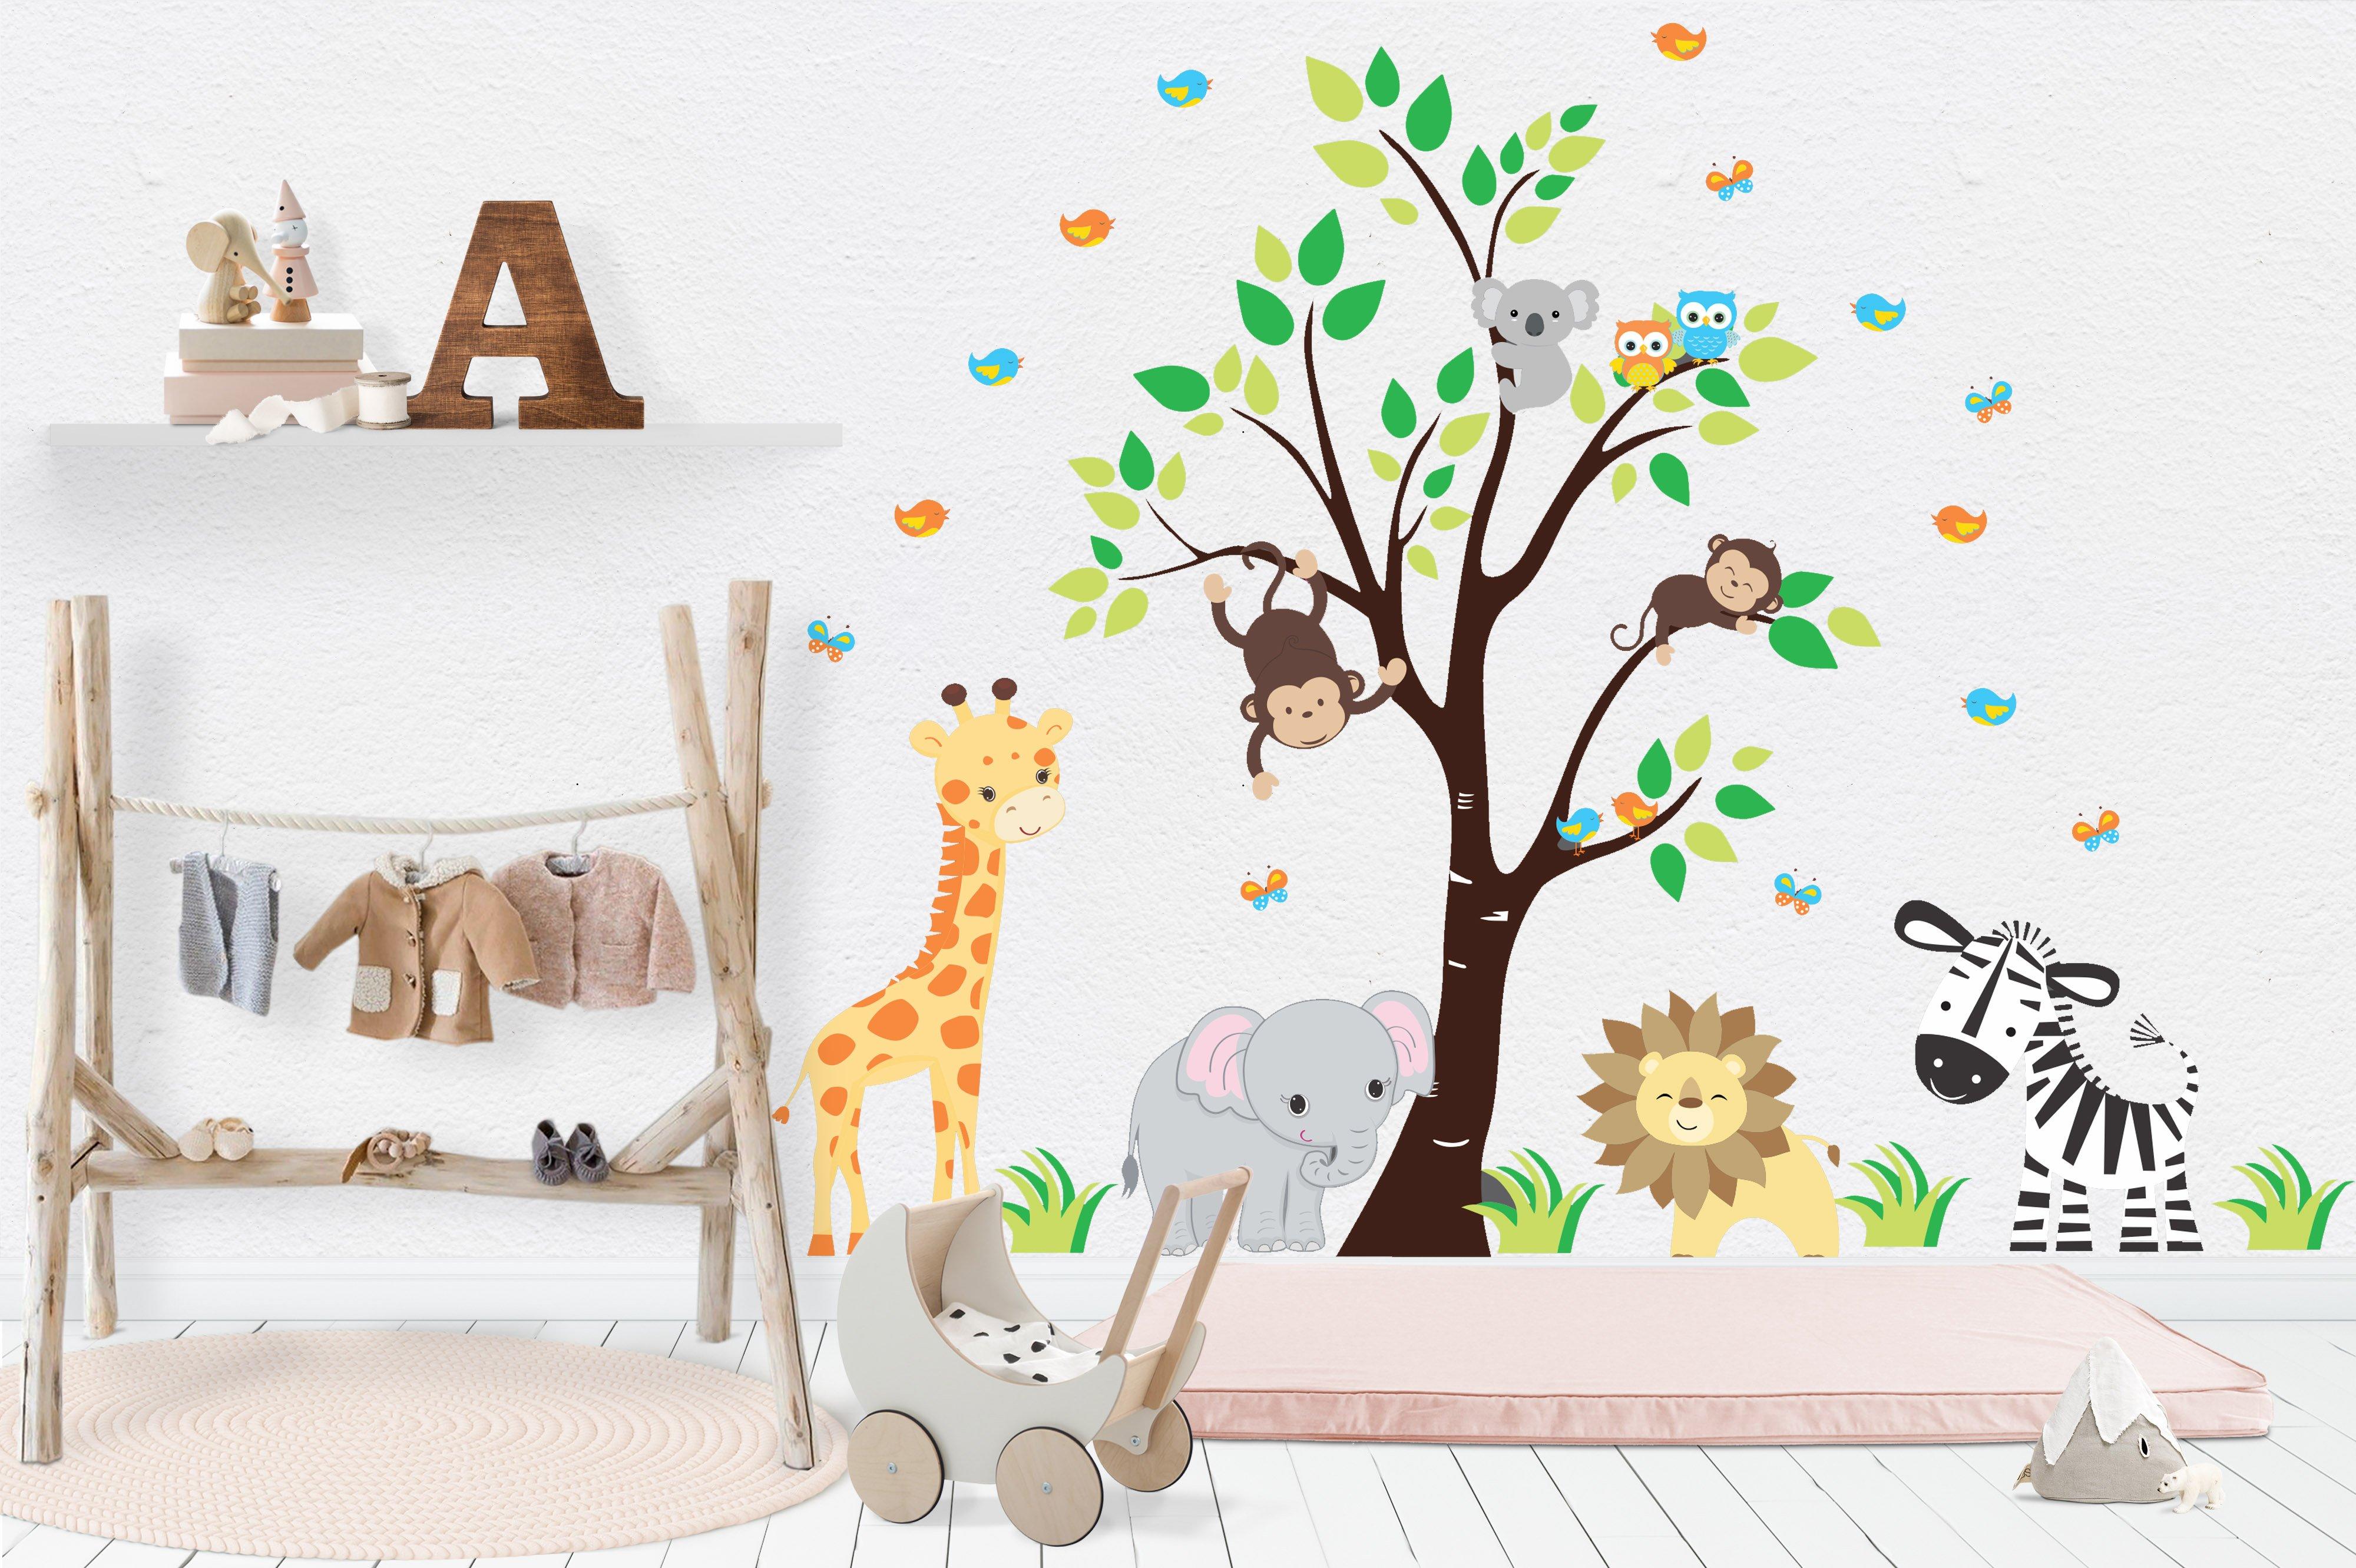 Nursery Wall Decals Safari Nursery Stickers Baby Room Decals Giraffe Elephant Lion Zebra Baby Room Decals Nursery Stickers Safari Nursery Stickers